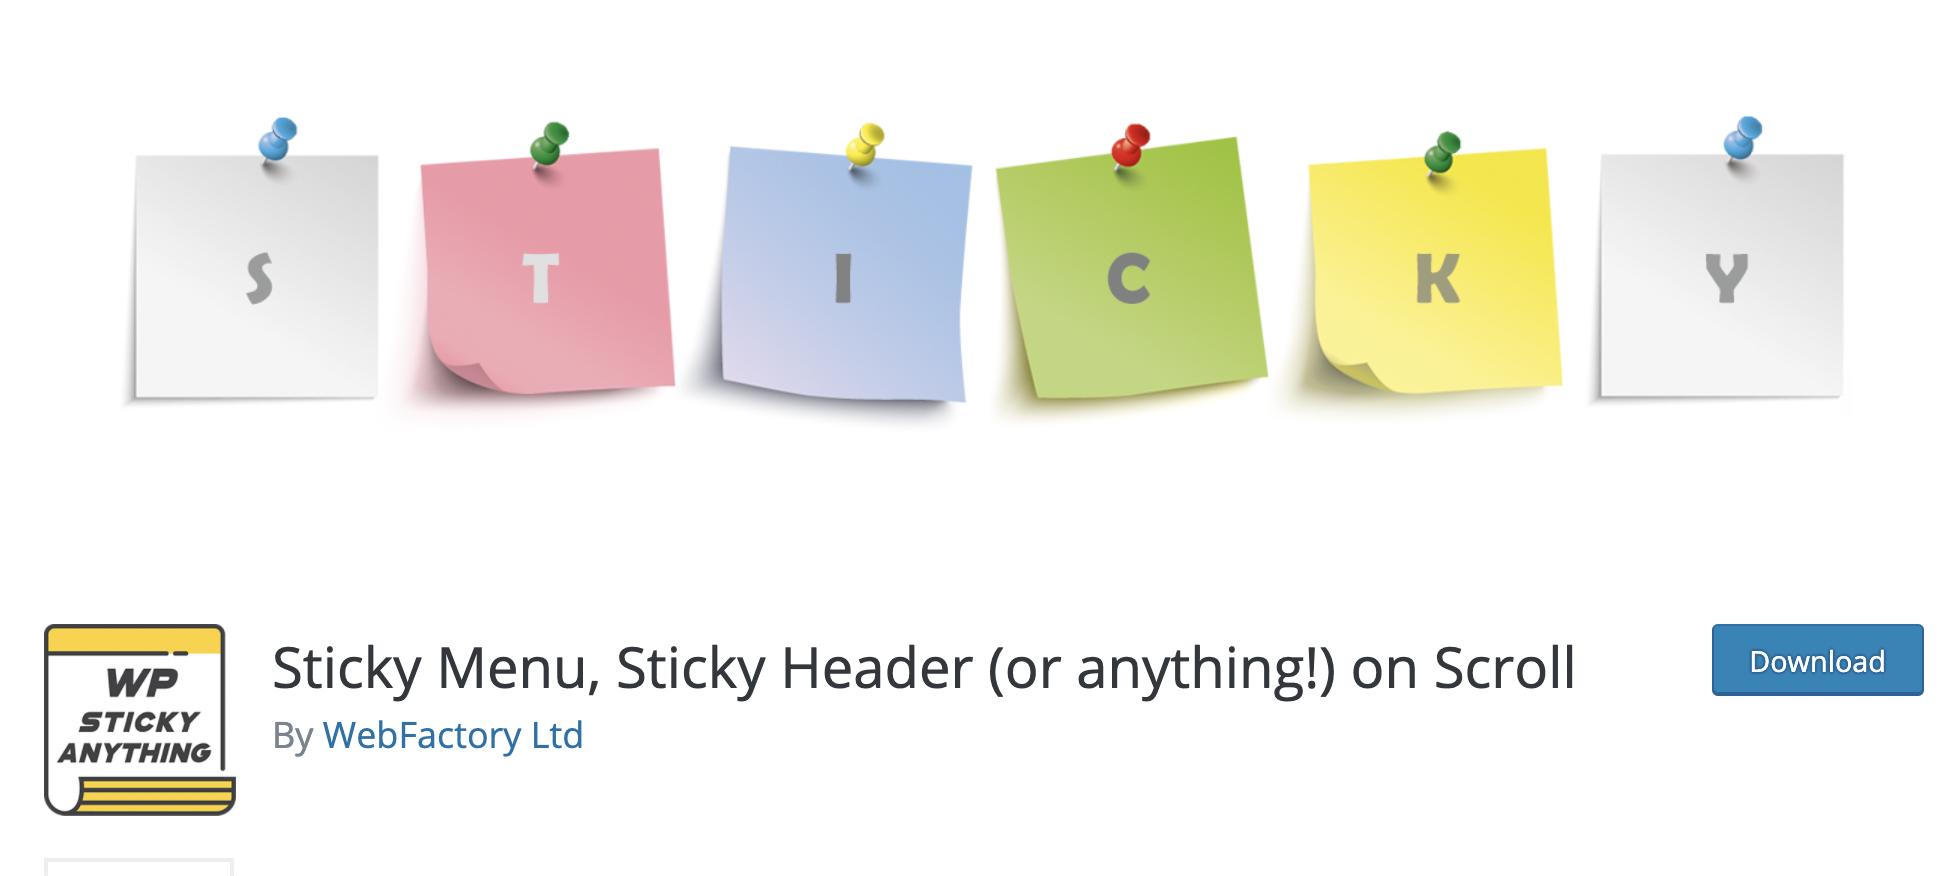 Sticky Menu, Sticky Header (or anything!) on Scroll